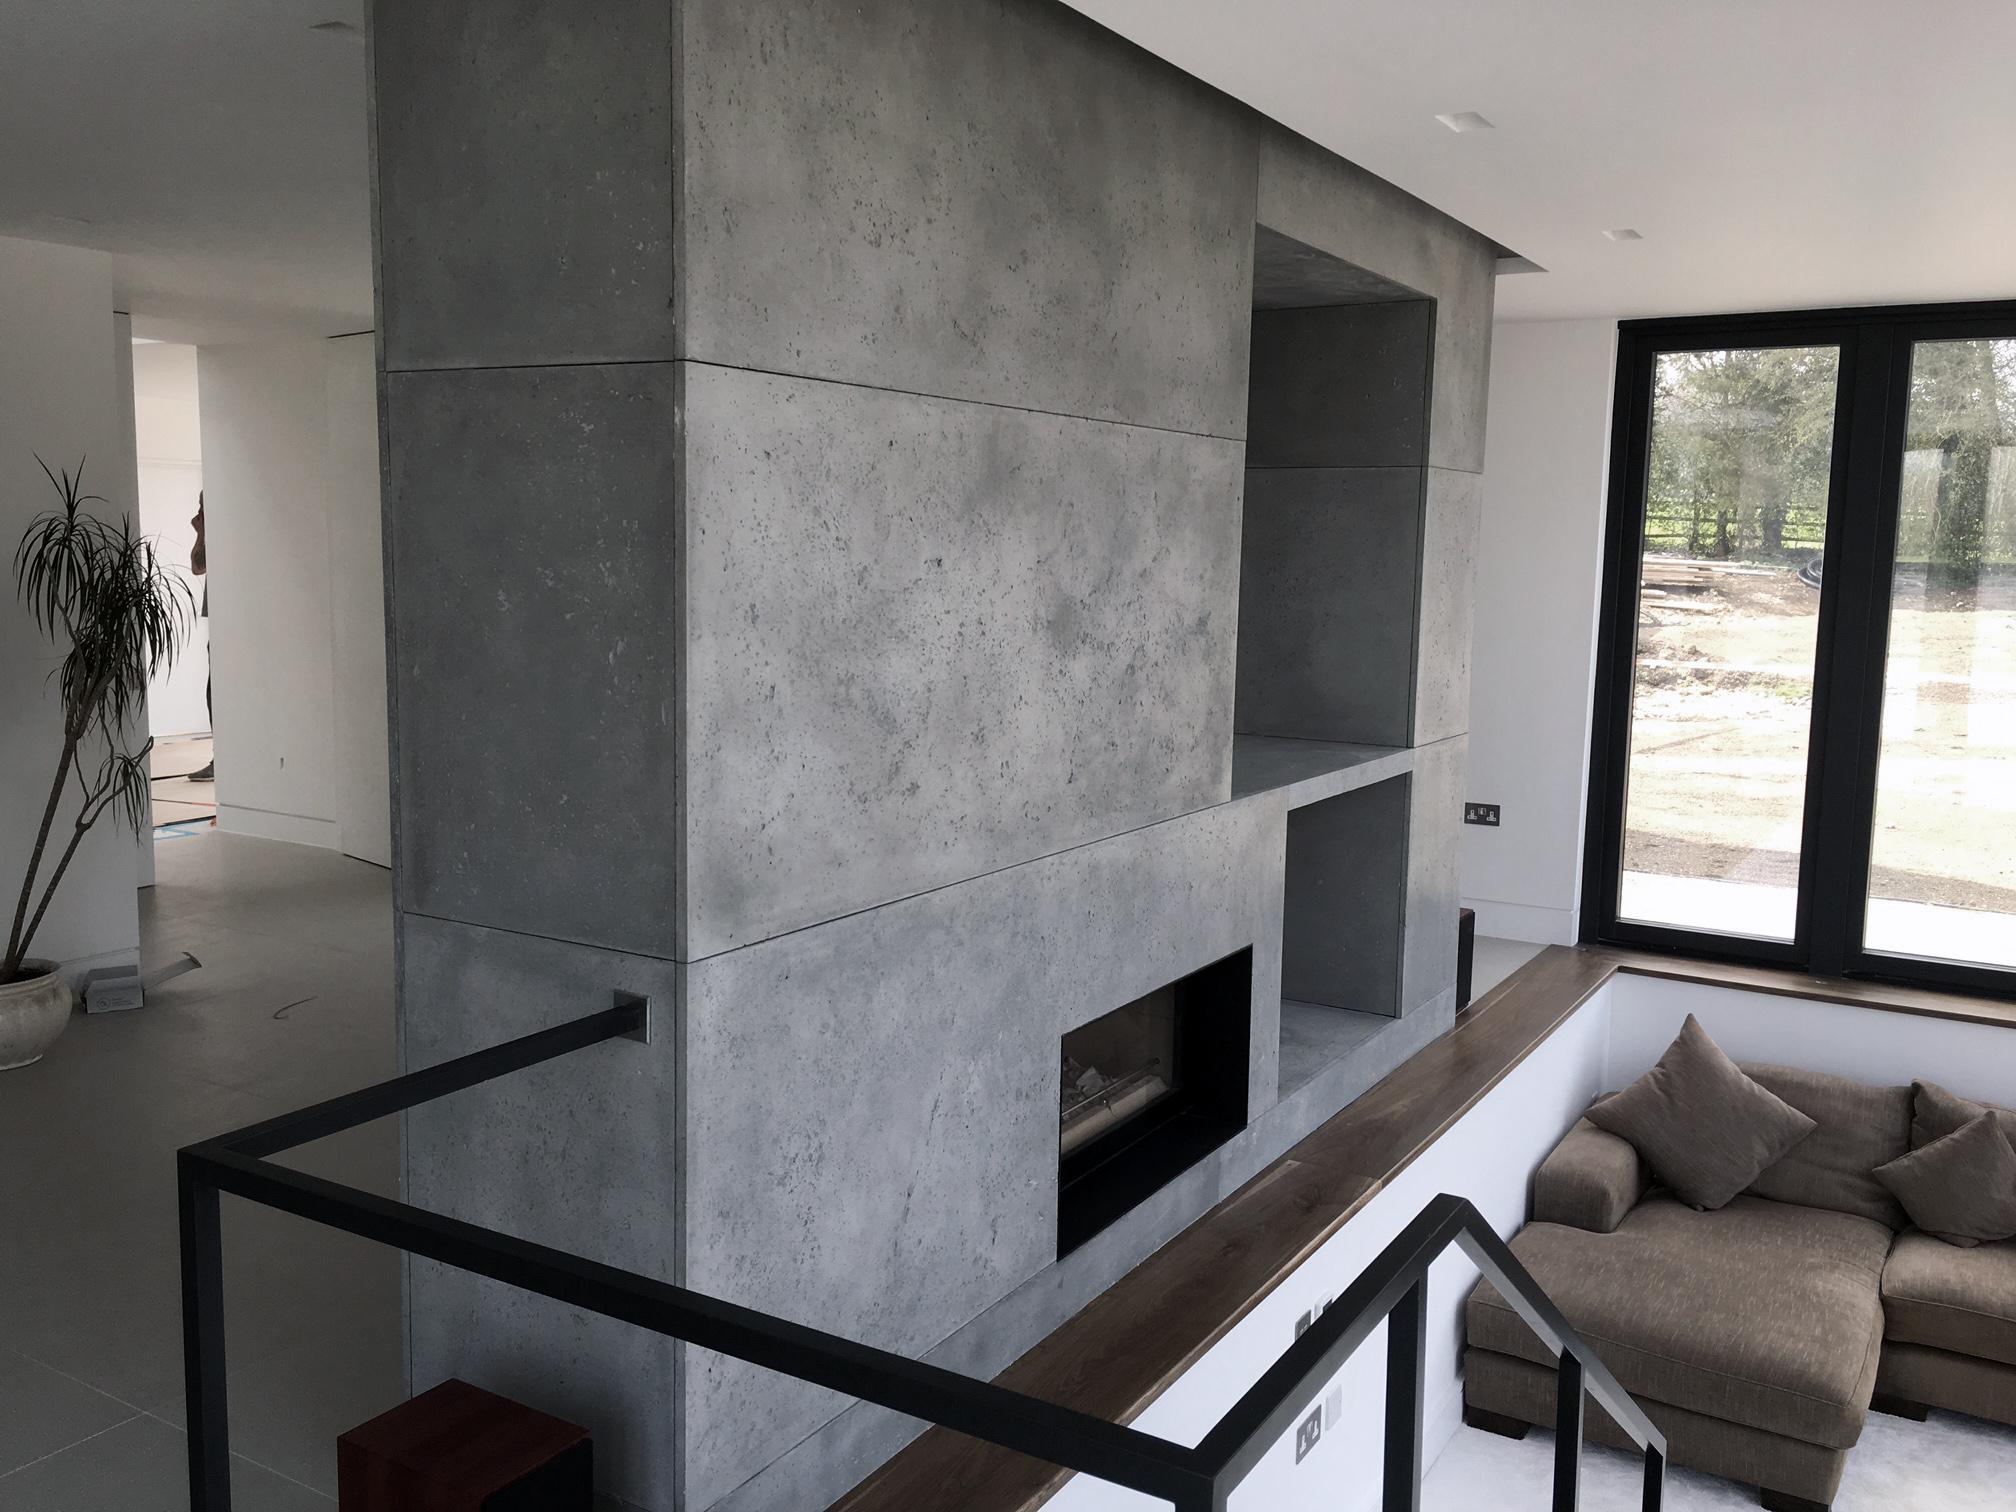 Concrete-fireplace-surround-tiles.jpg